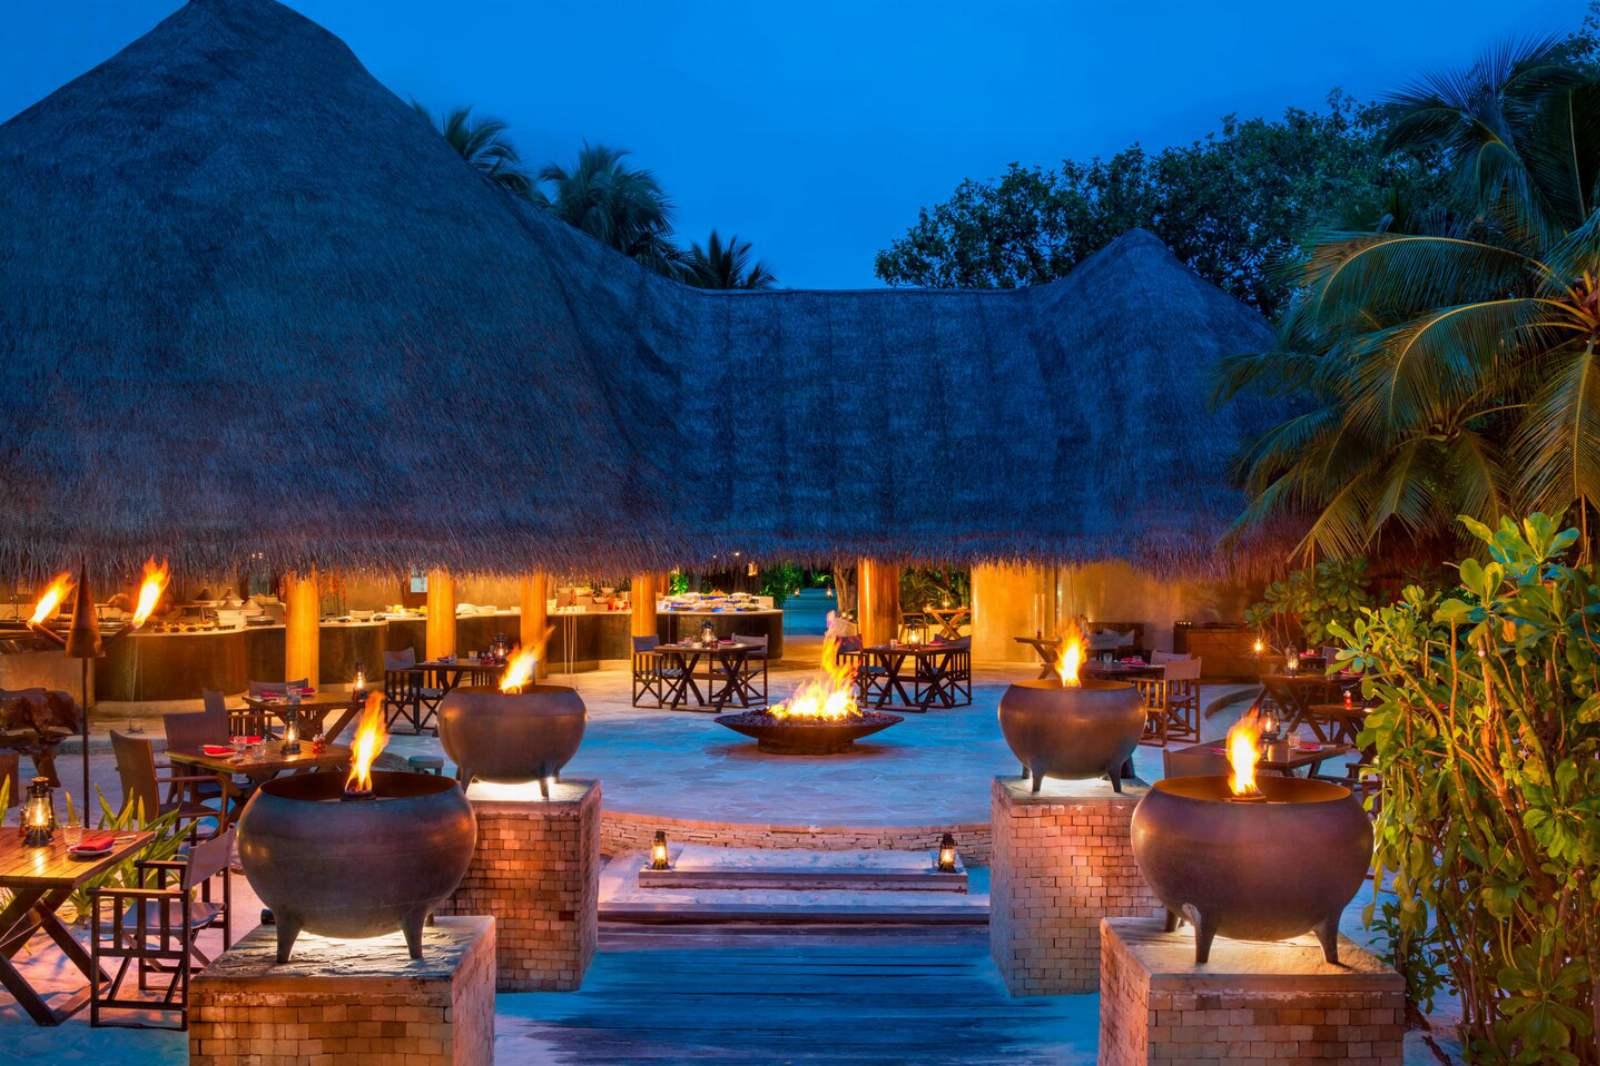 W Maldives - Outdoor Lounge Area